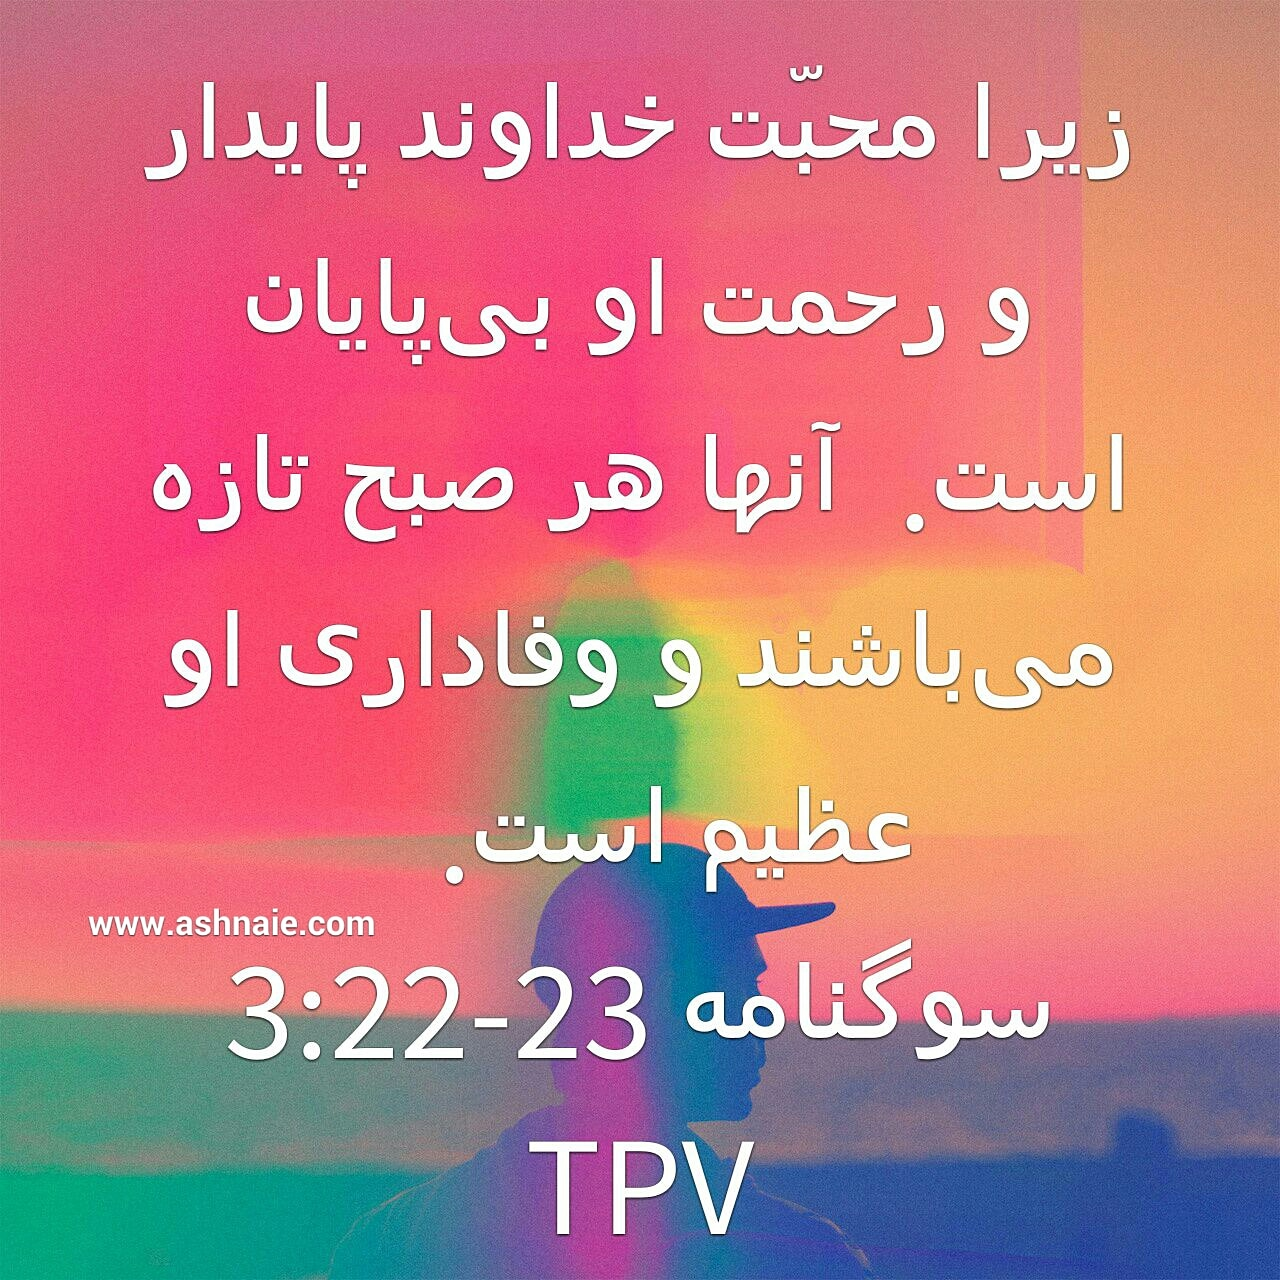 IMG_20180716_004913_961.jpg